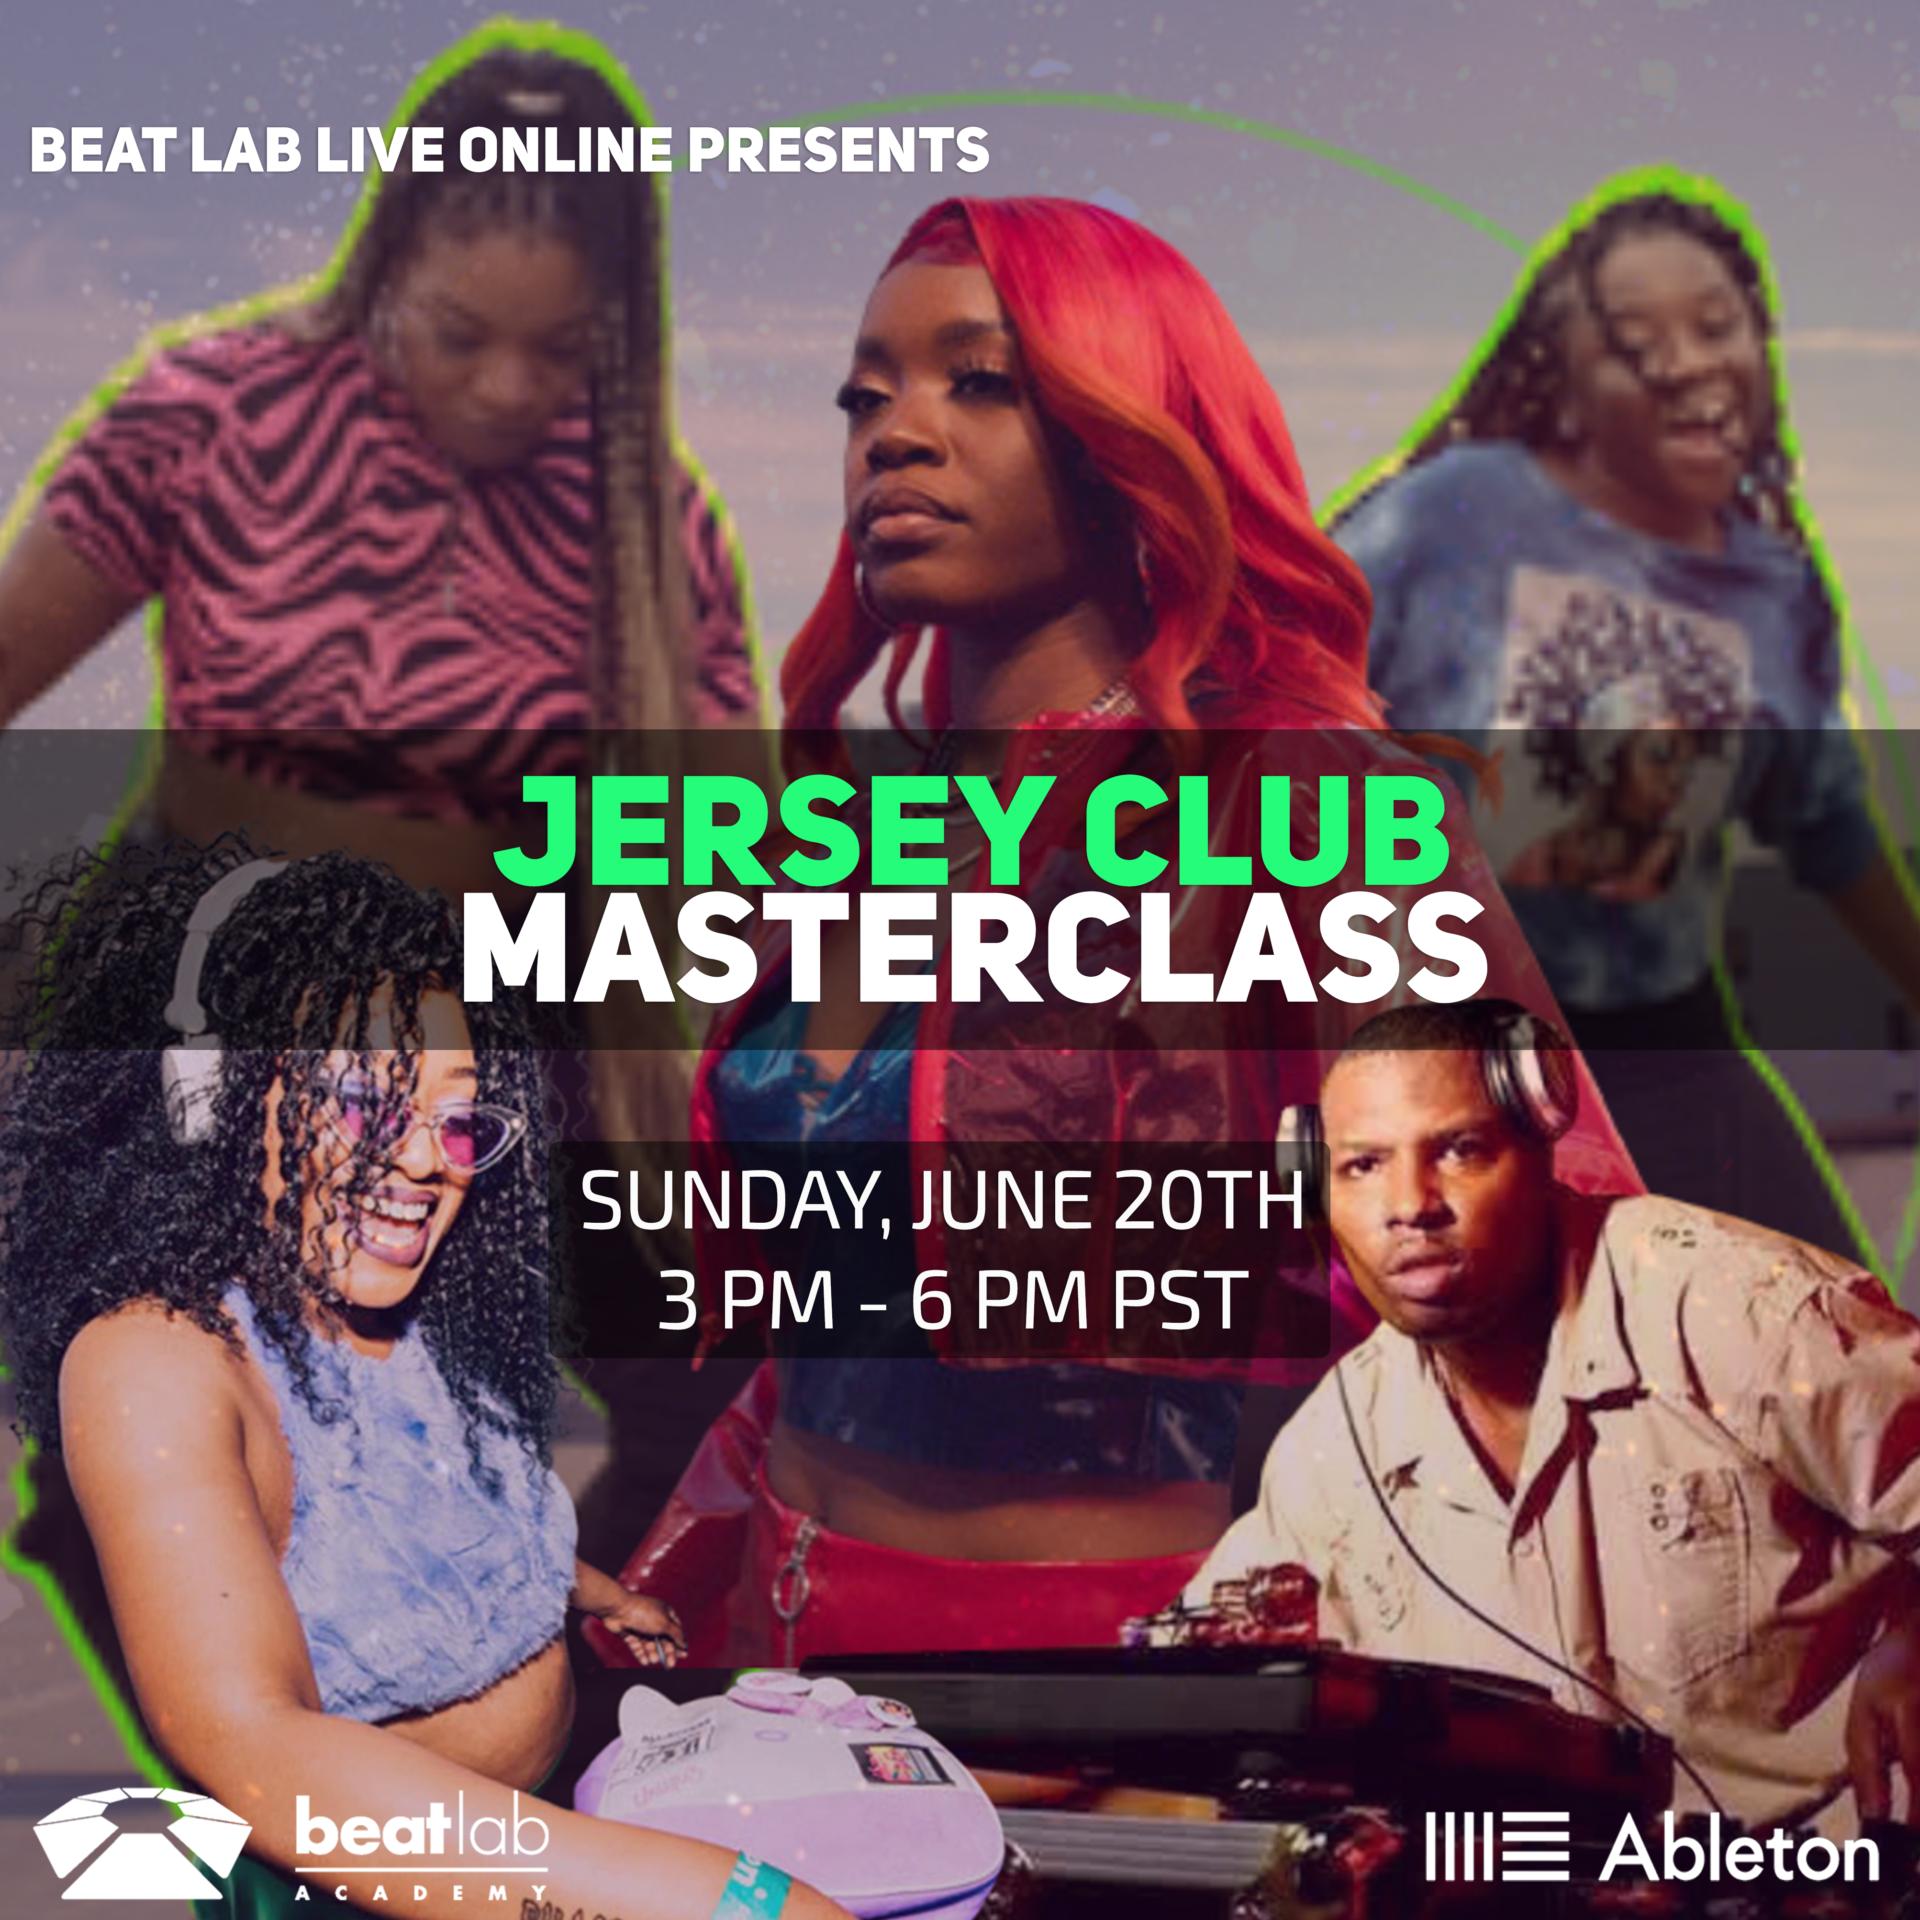 Jersey Club MASTERCLASS